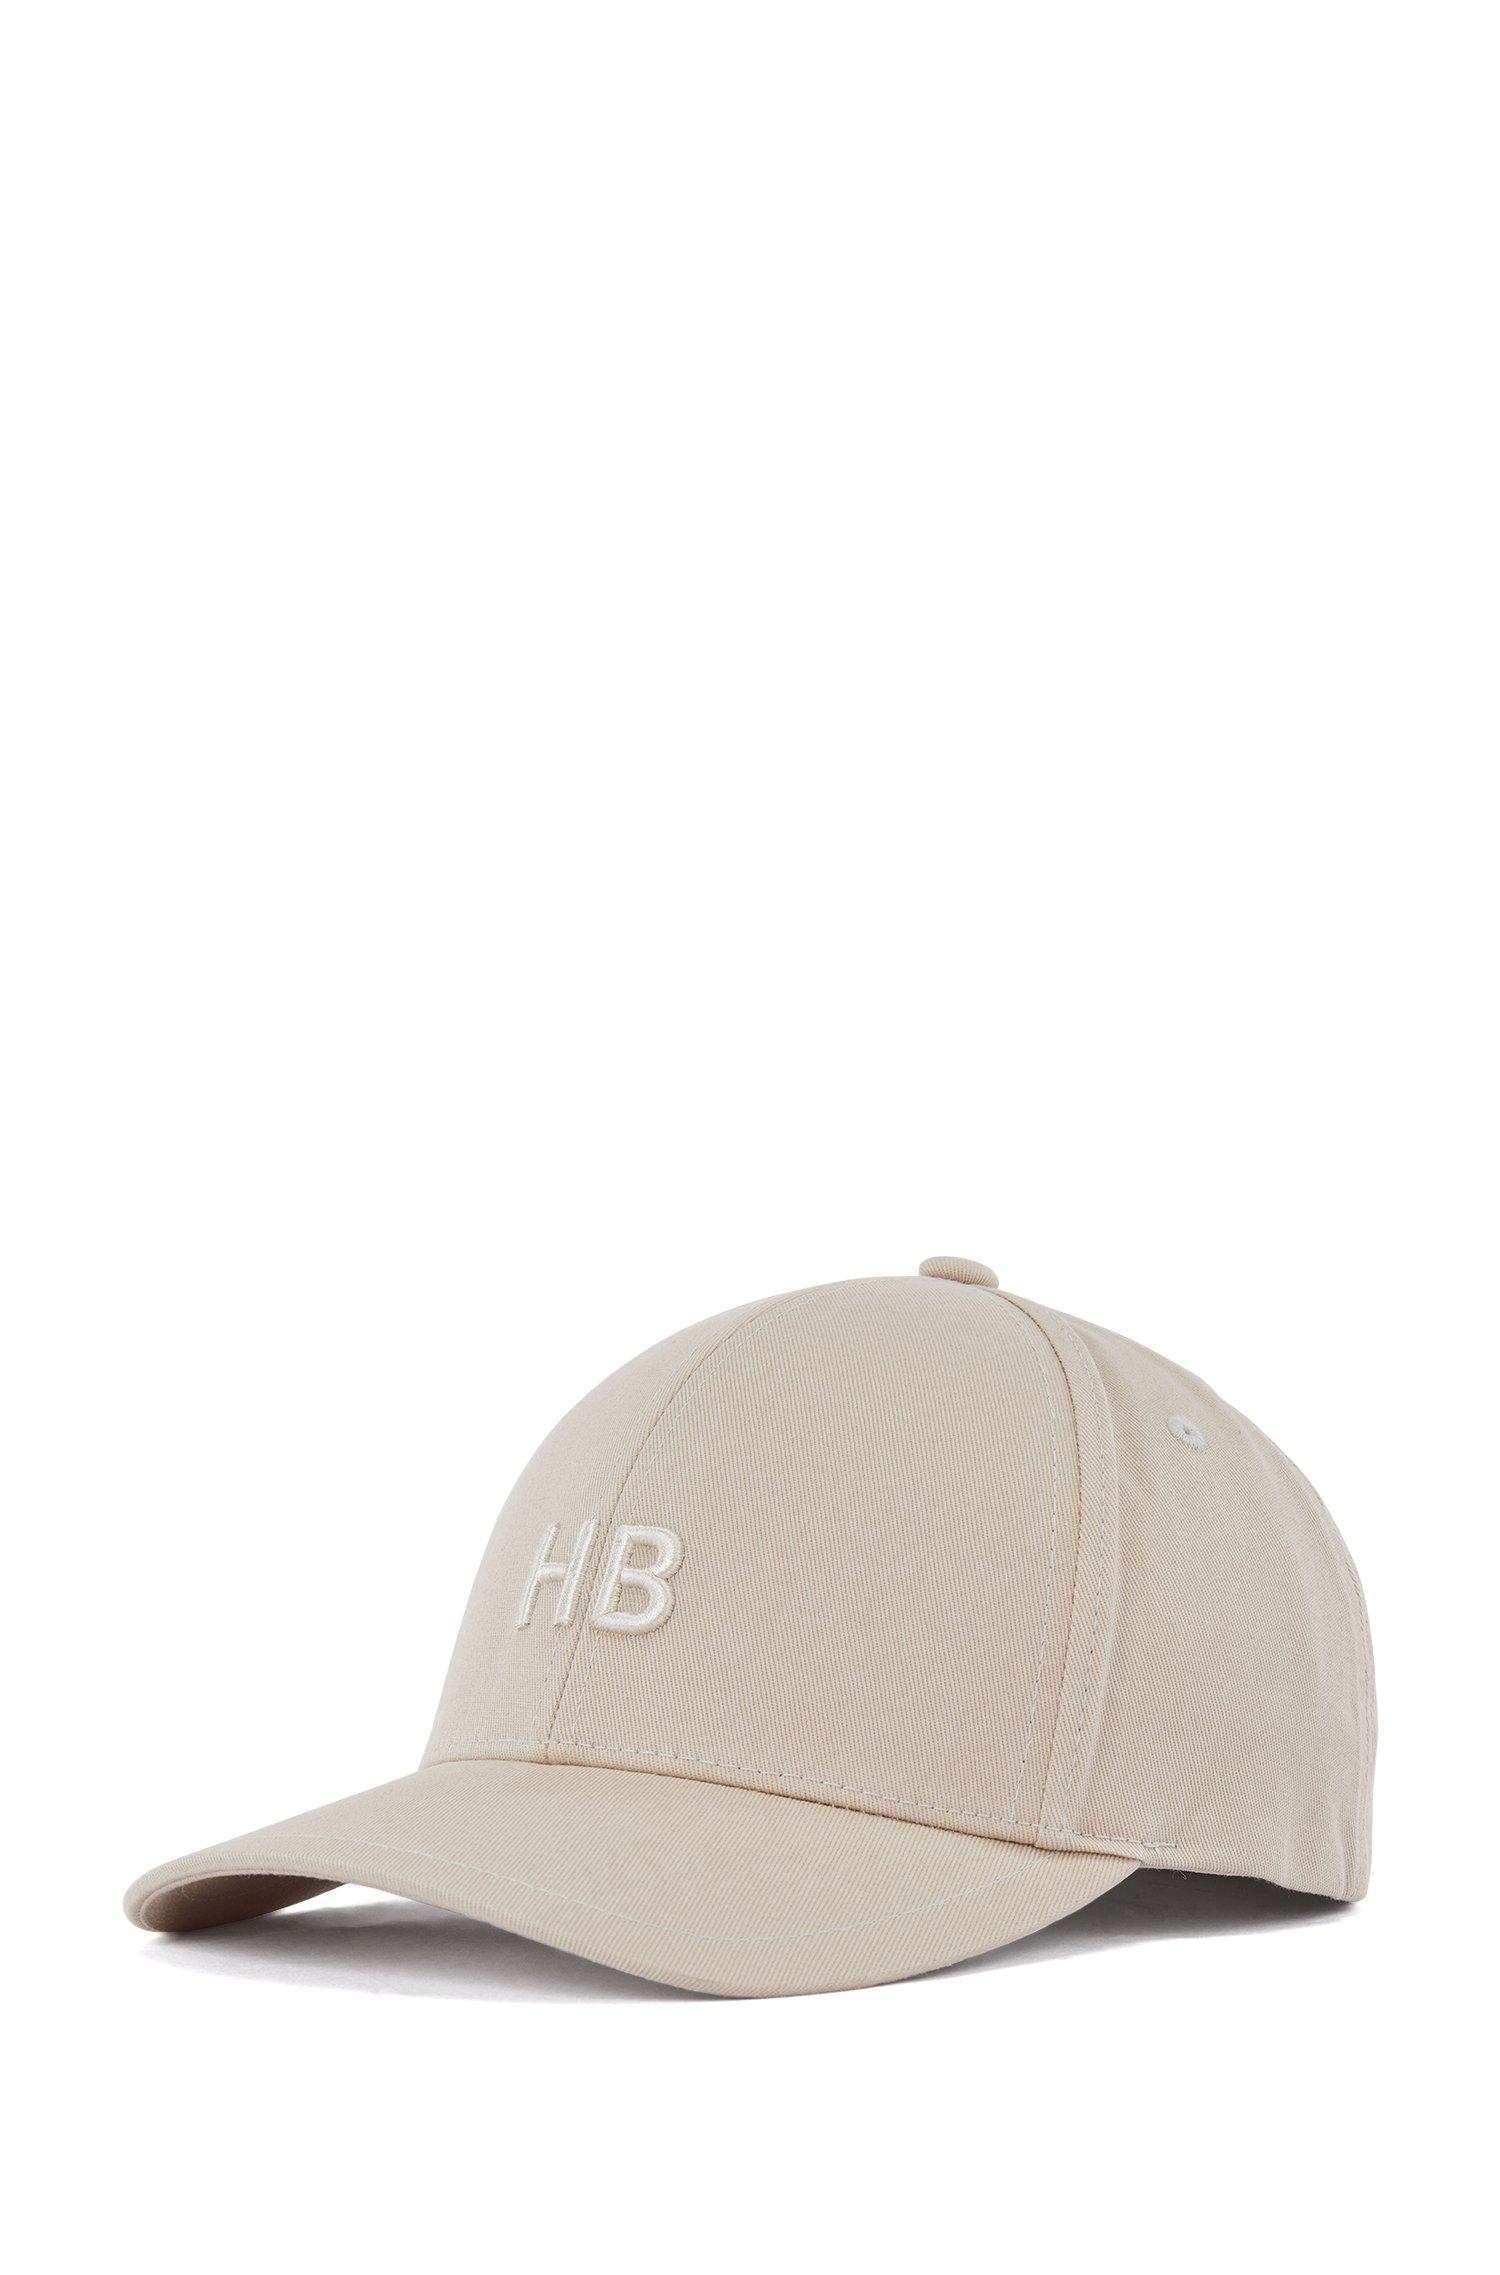 Monogram cap in cotton twill, Light Beige